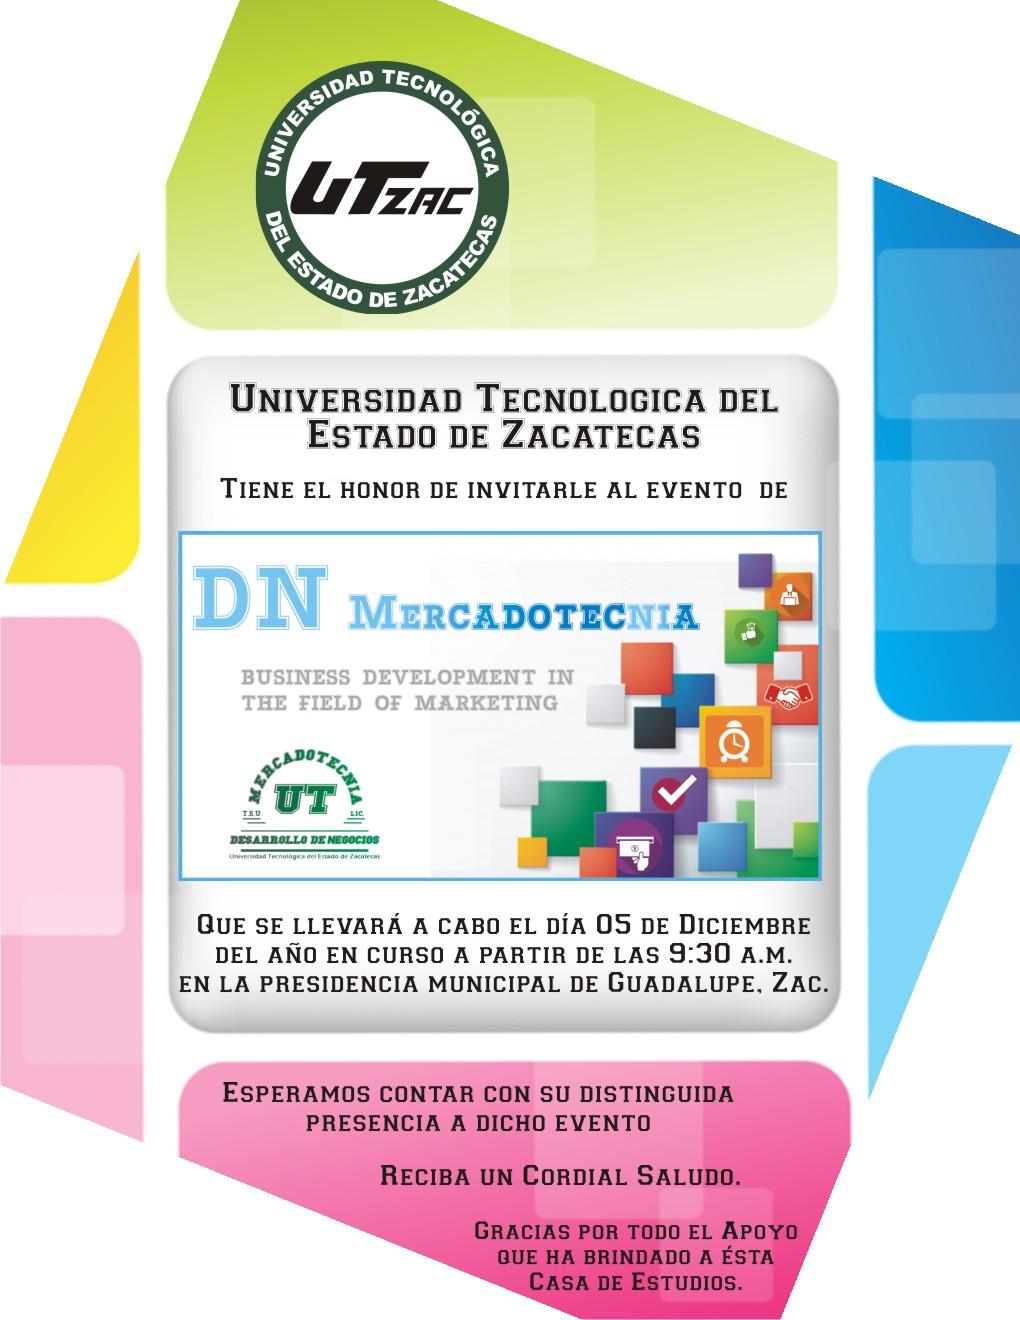 Invitación a la Presentación de Proyectos de DN Mercadotecnia